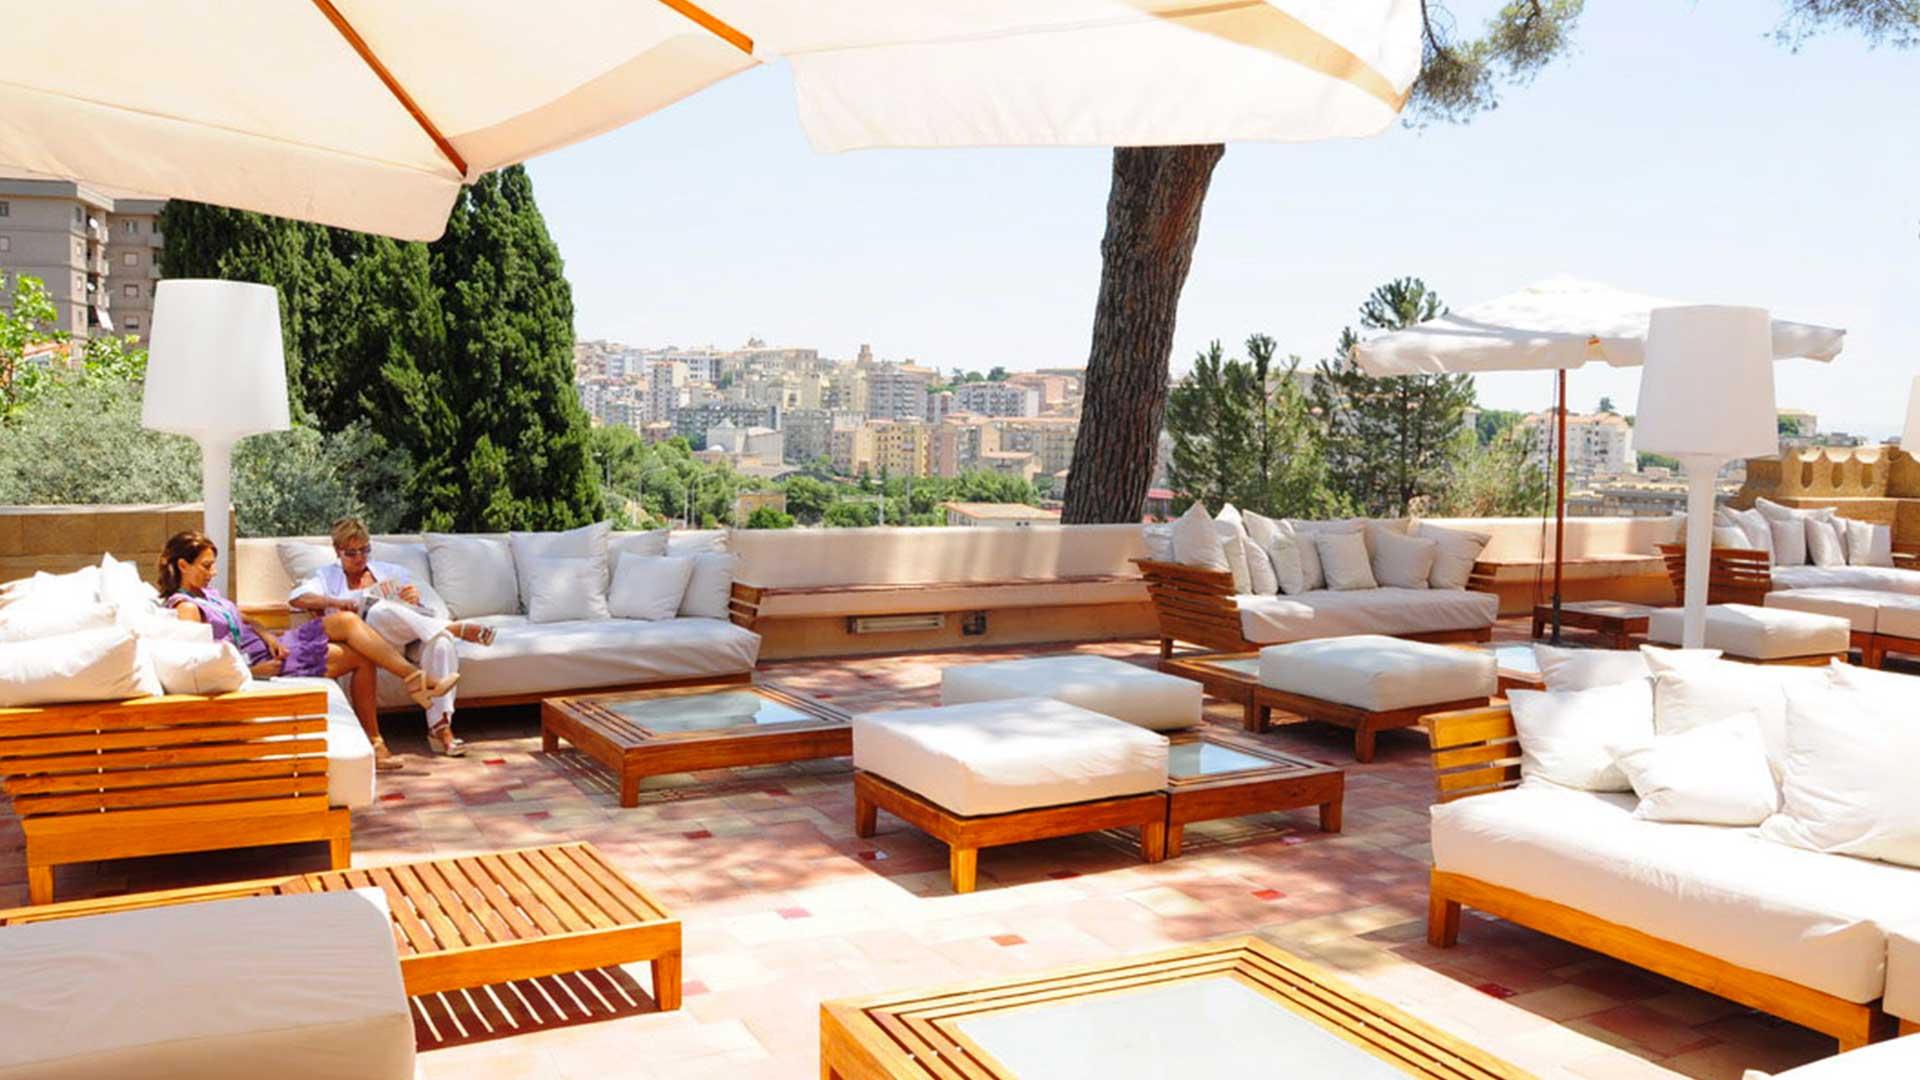 Villa Barile Restaurant - Sicily